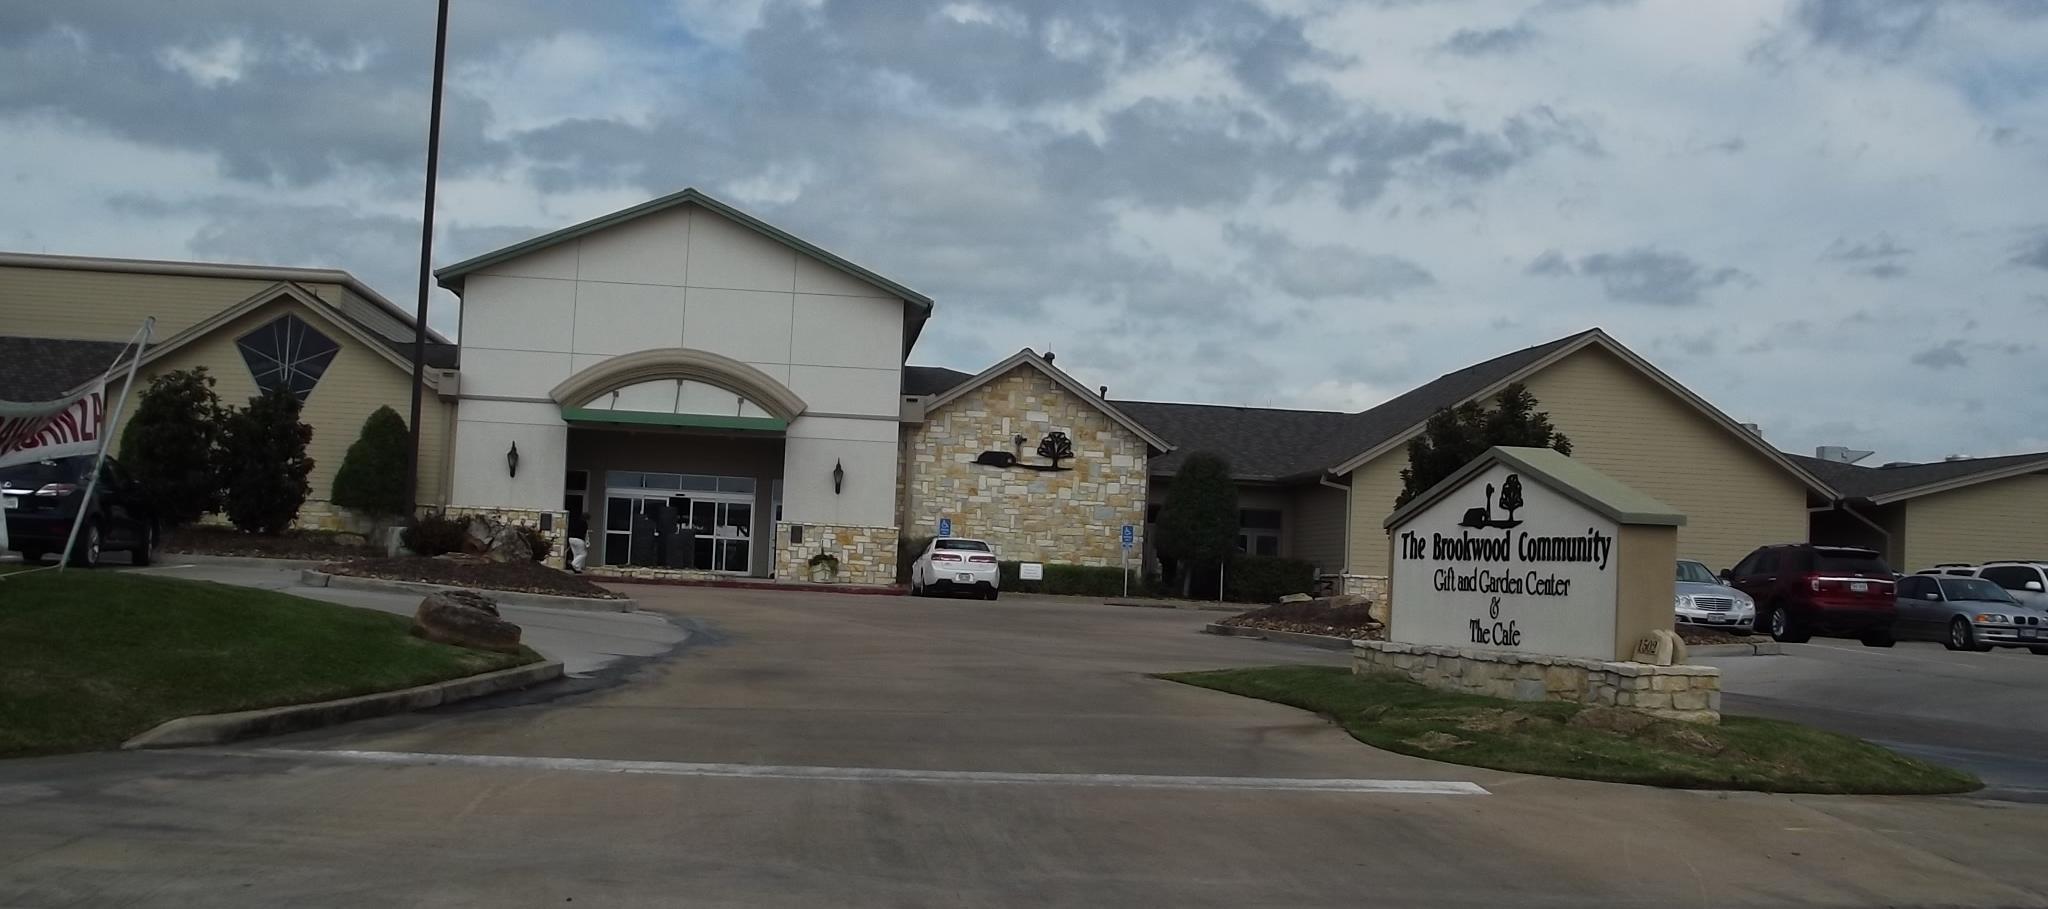 Brookwood Community Cafe & Gift & Garden Center